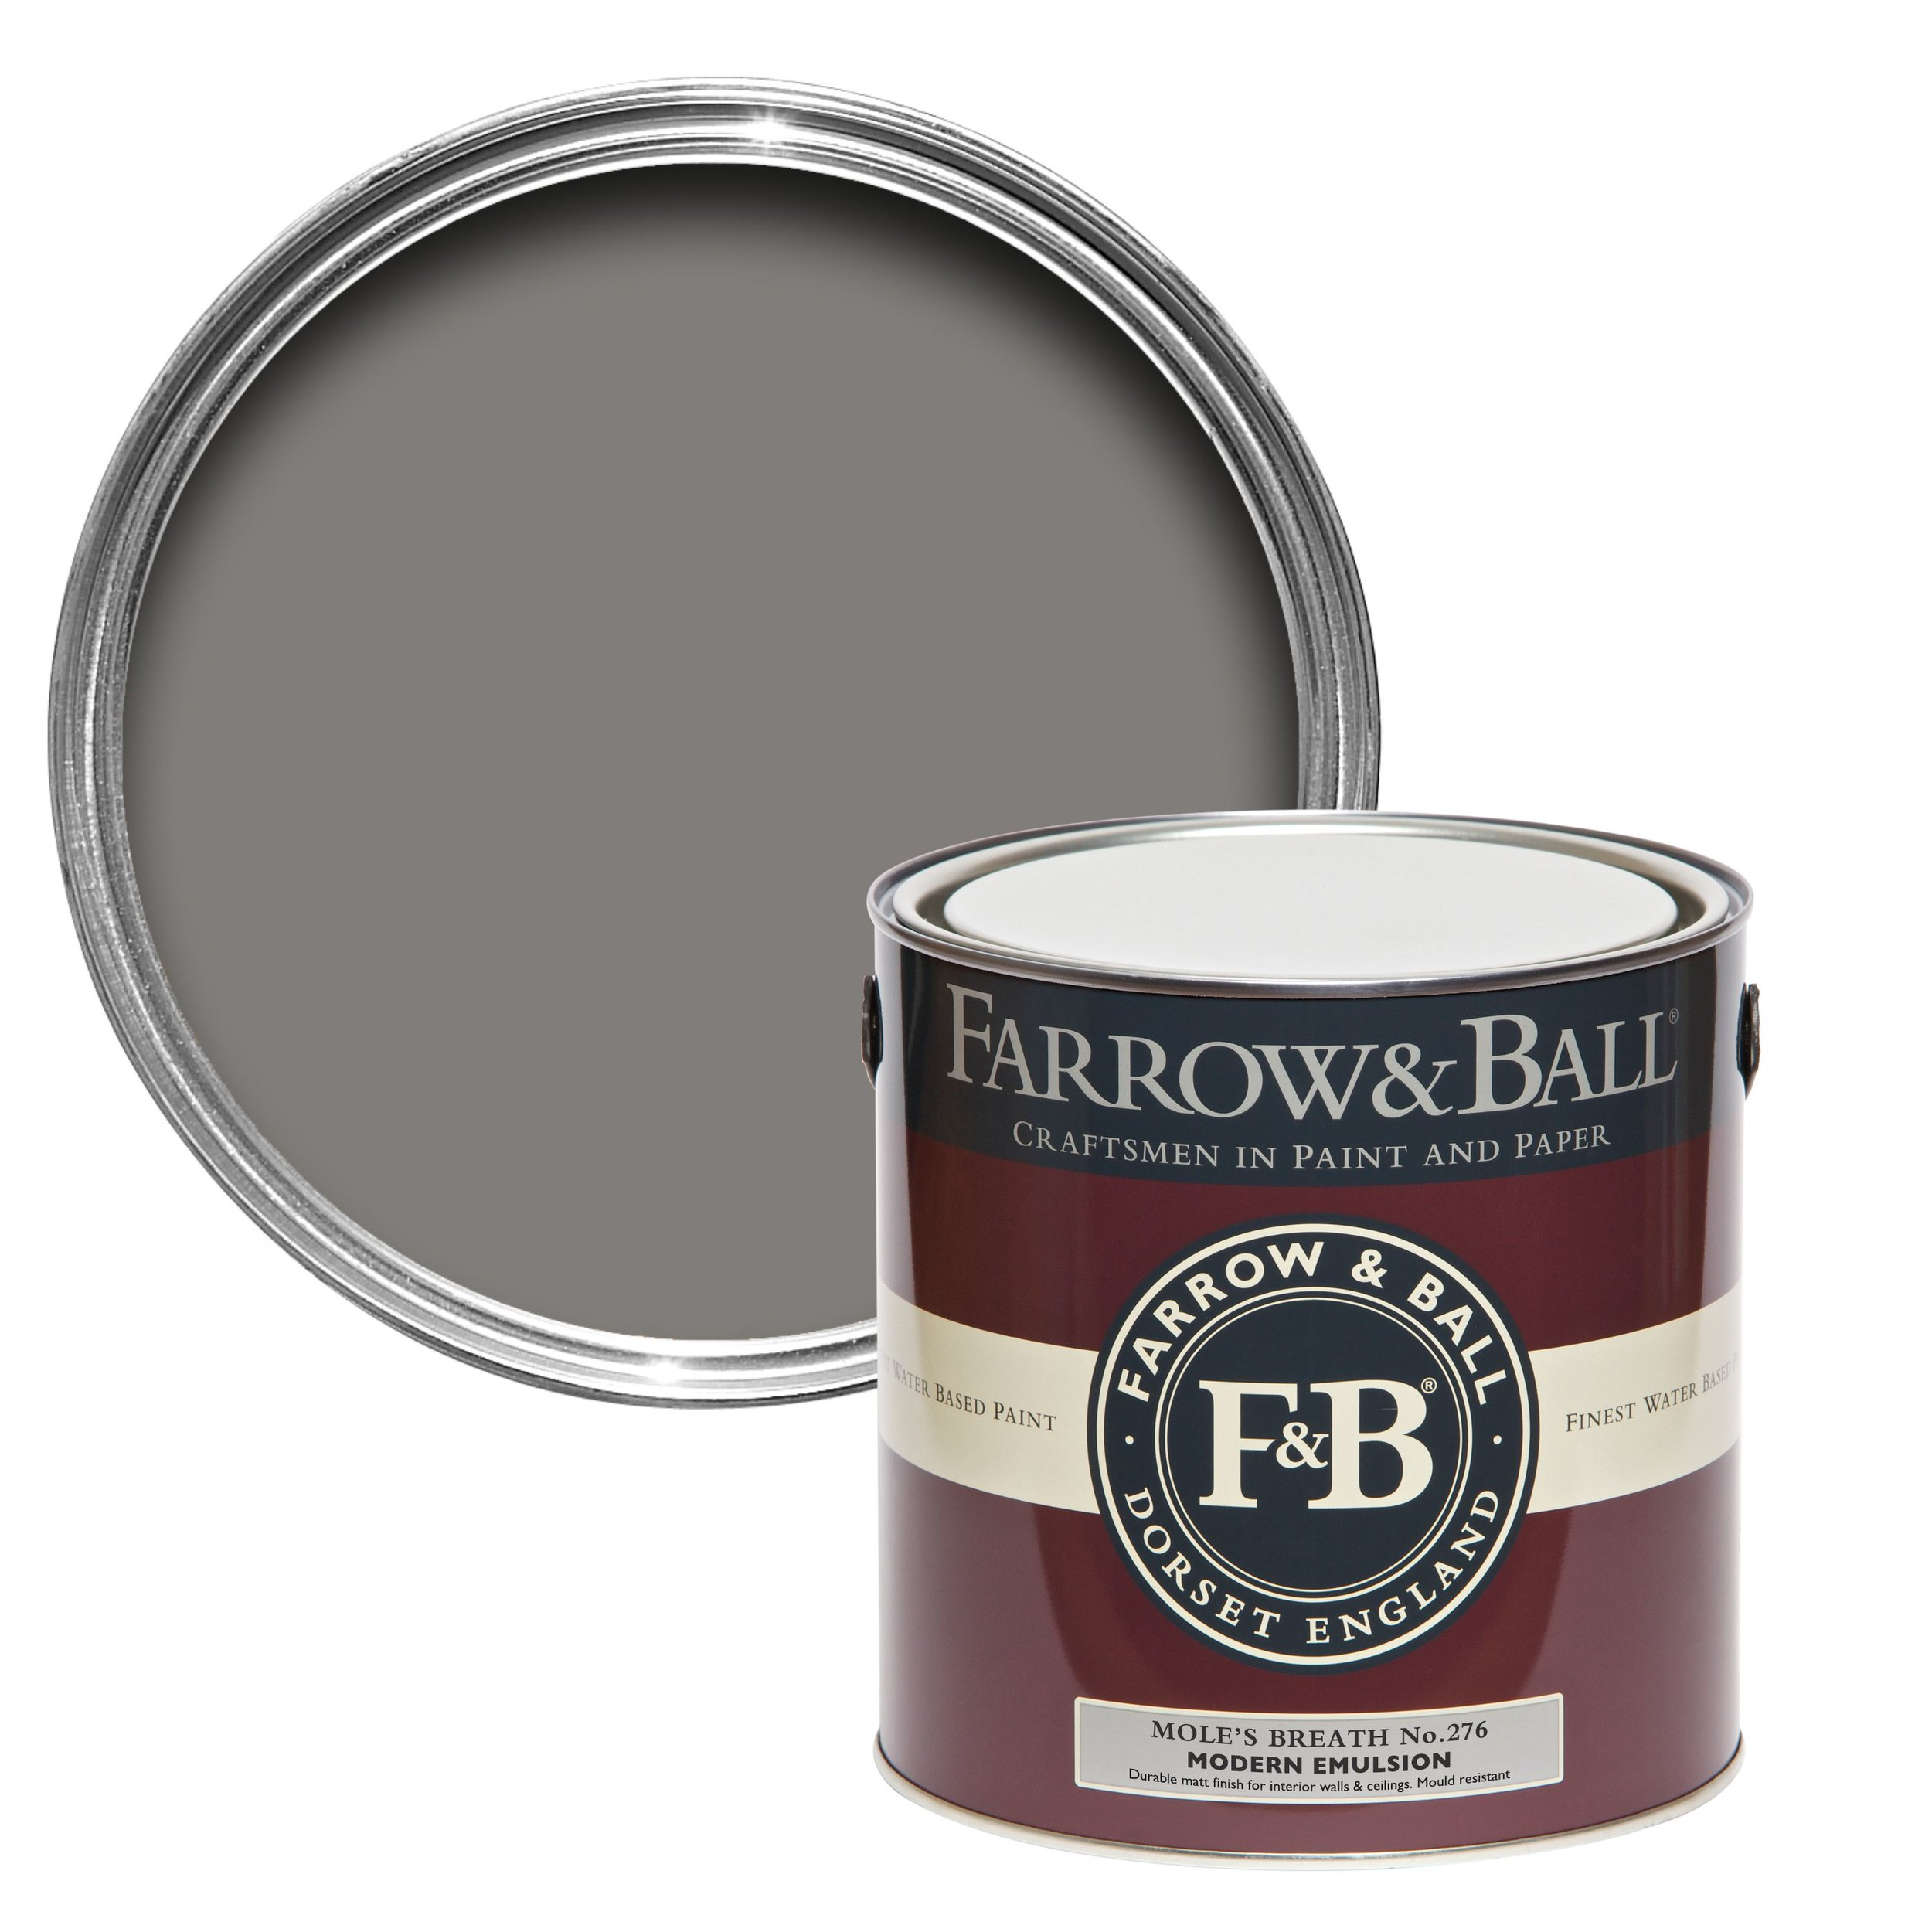 Copy of Farrow & Ball Mole's Breath